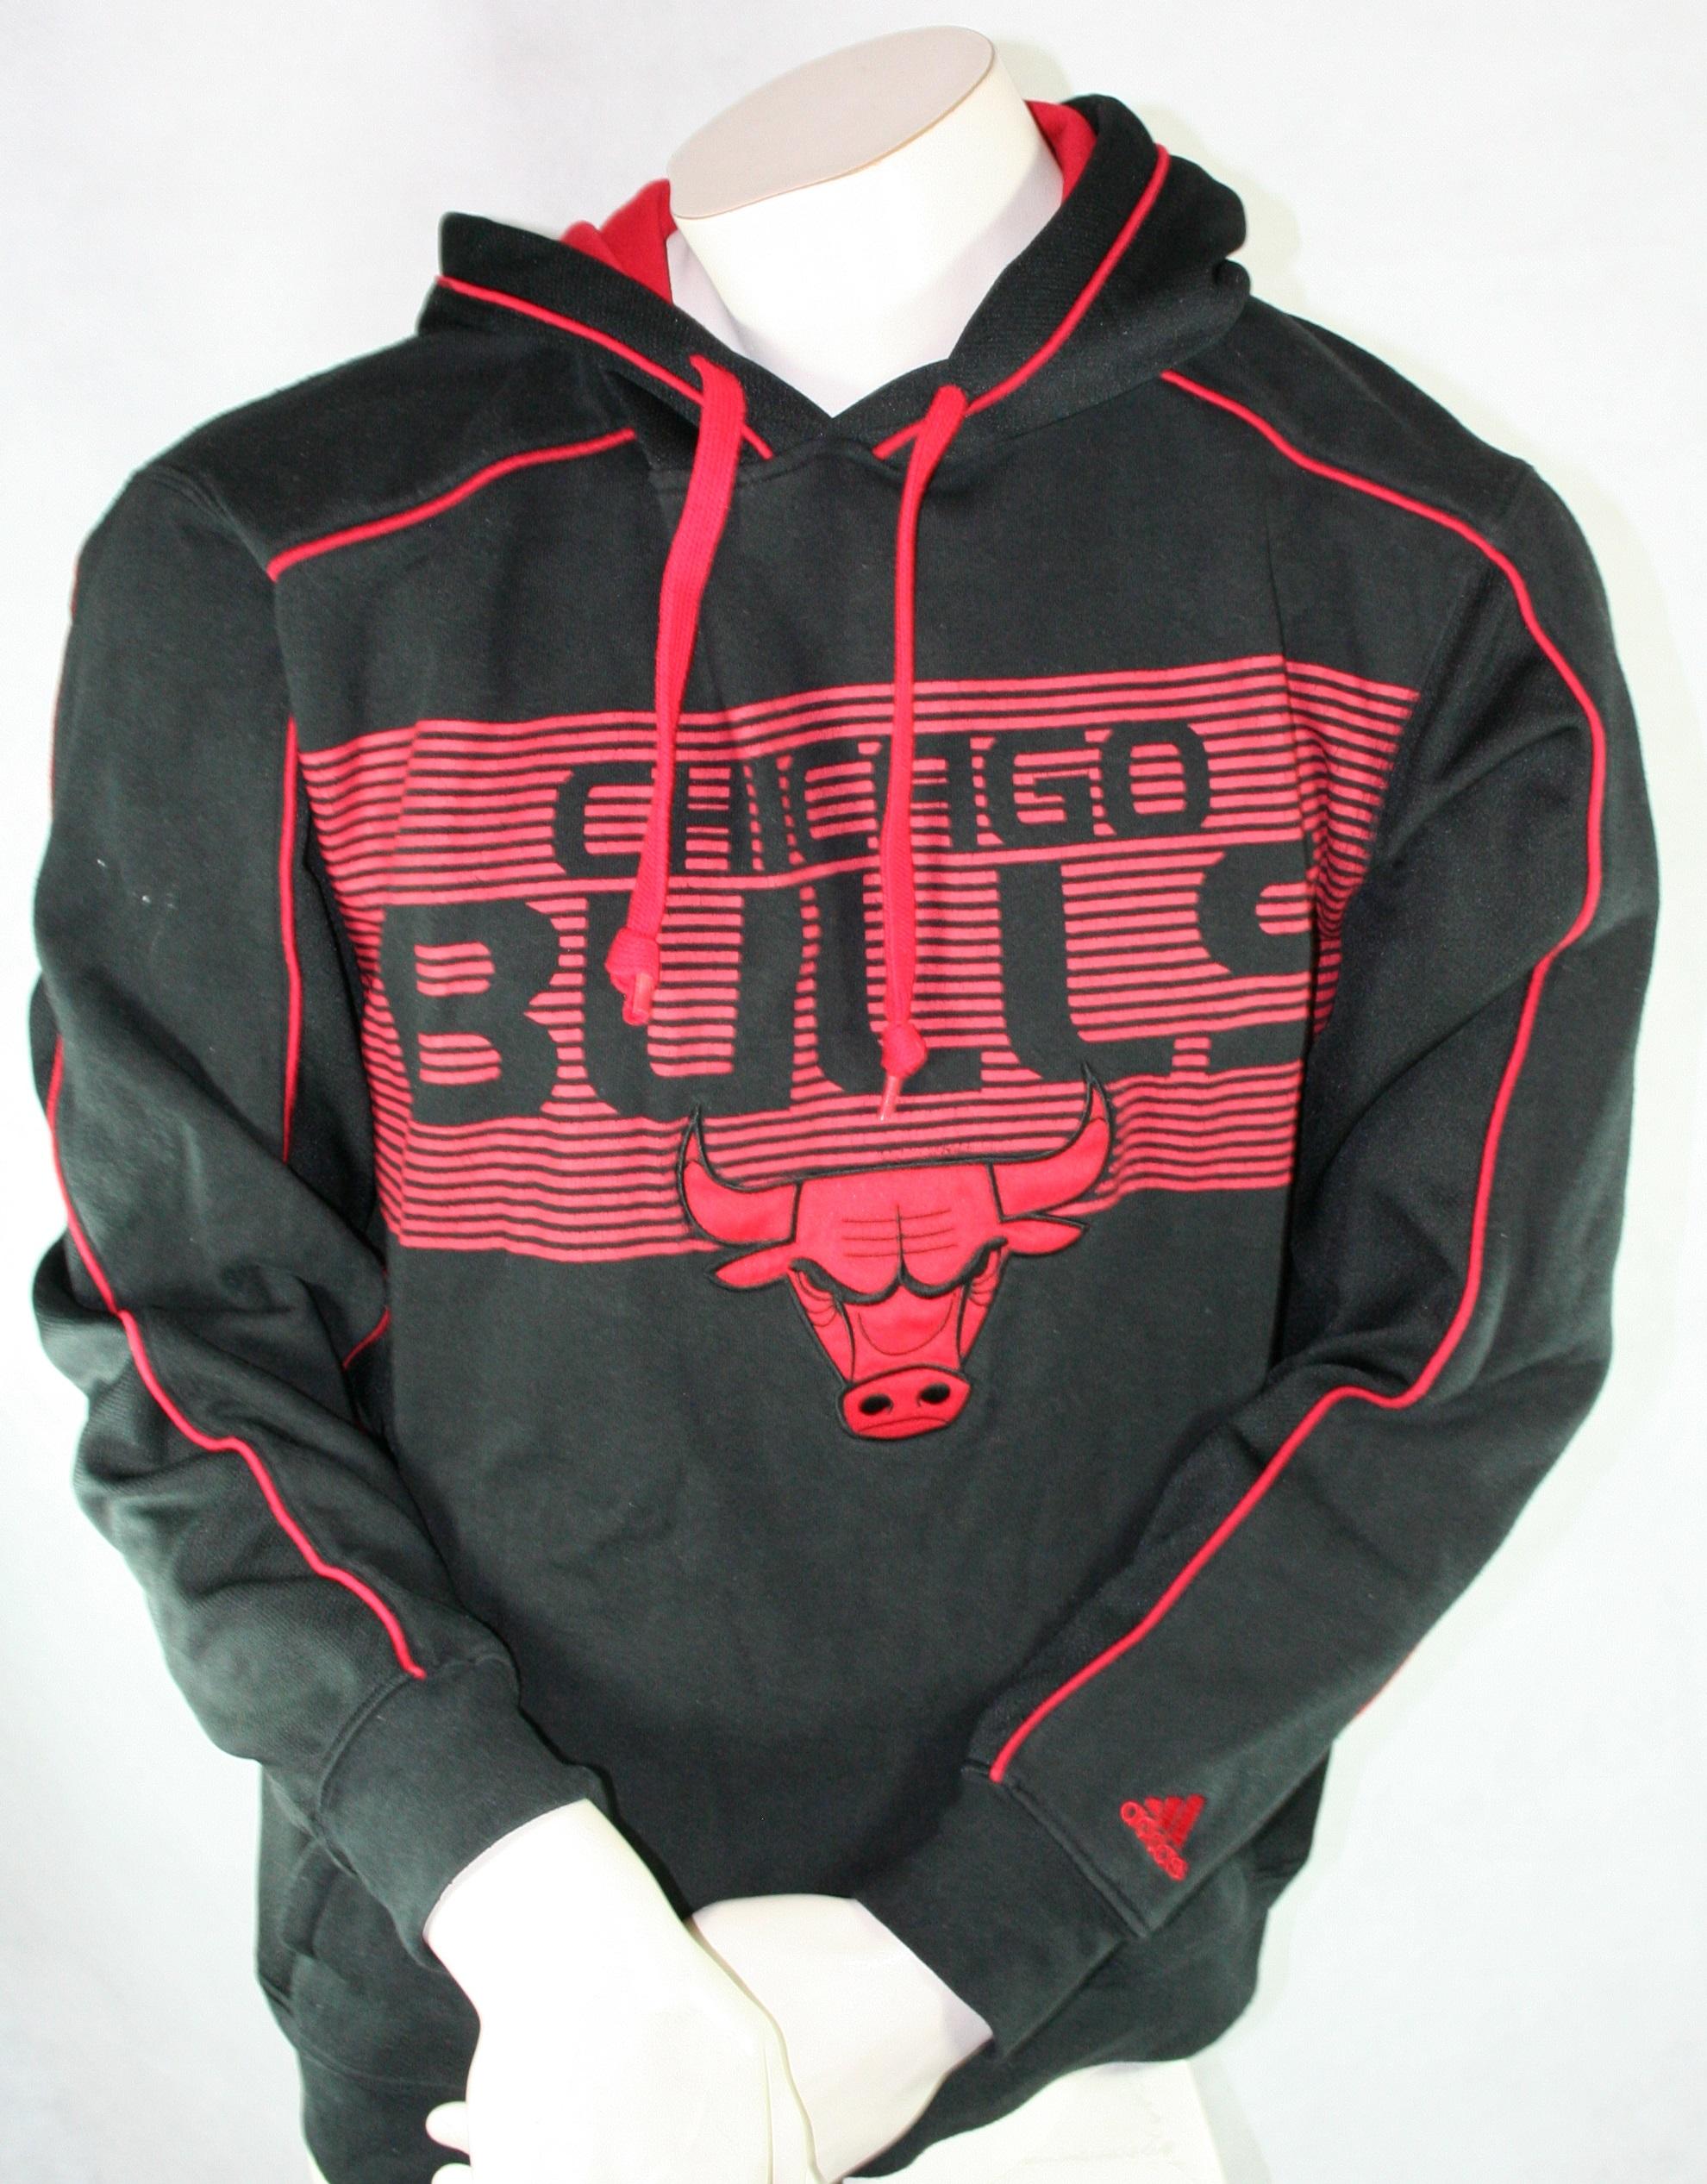 identificación Geometría inflación  Adidas Chicago Bulls sweater Hoodie Sweatshirt NBA Men's M/L buy and order  cheap online shop - spieler-trikot.de retro, vintage & old football shirts  & jersey from super stars